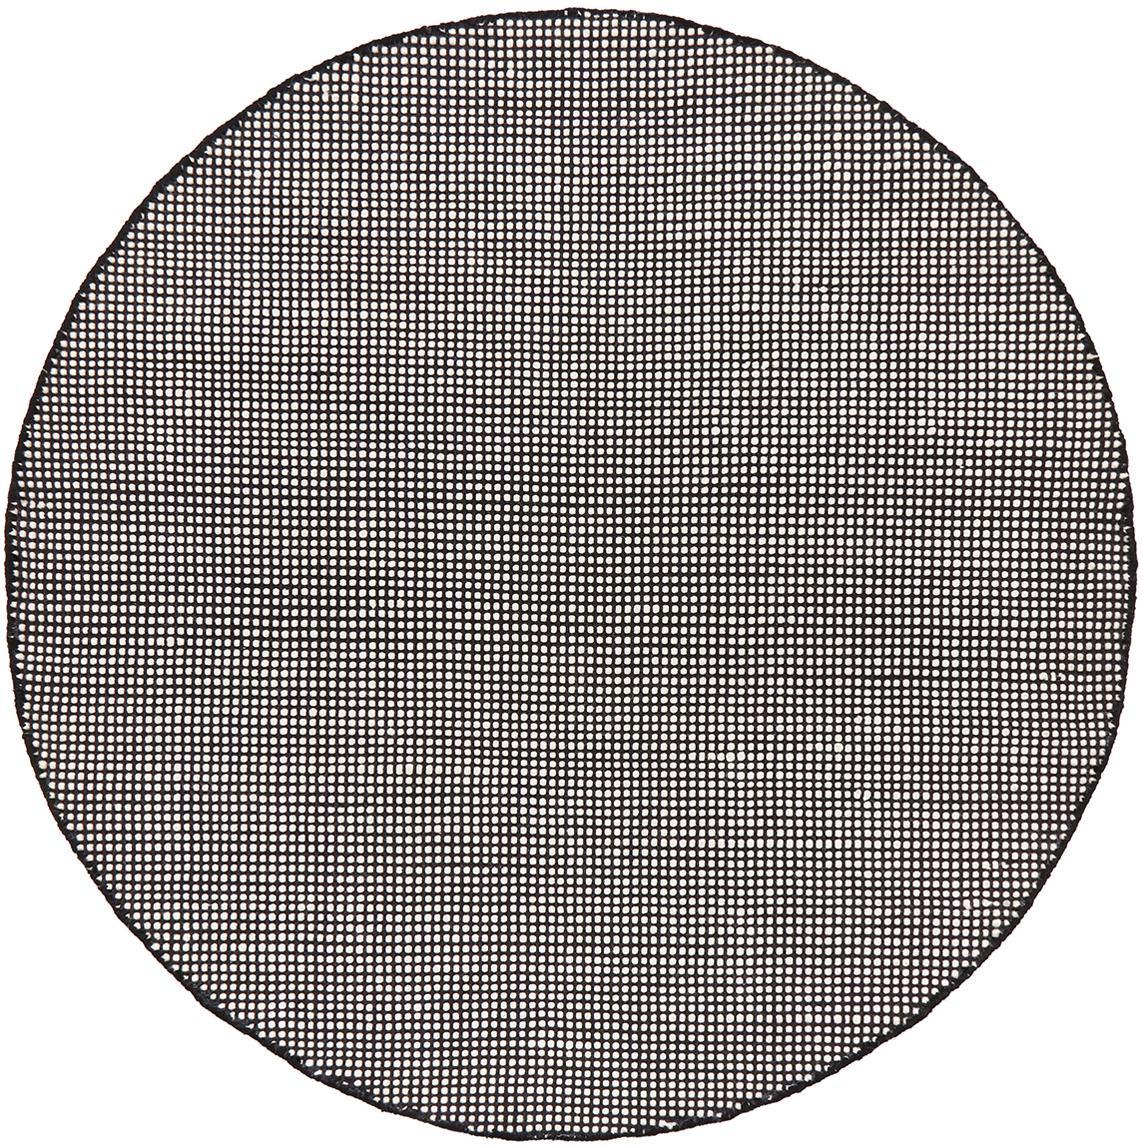 Alfombra redonda de lana tejida a mano Amaro, 38%lana, 22%poliéster, 20%algodón, 20%poliamida, Negro, blanco crema, Ø 140 cm